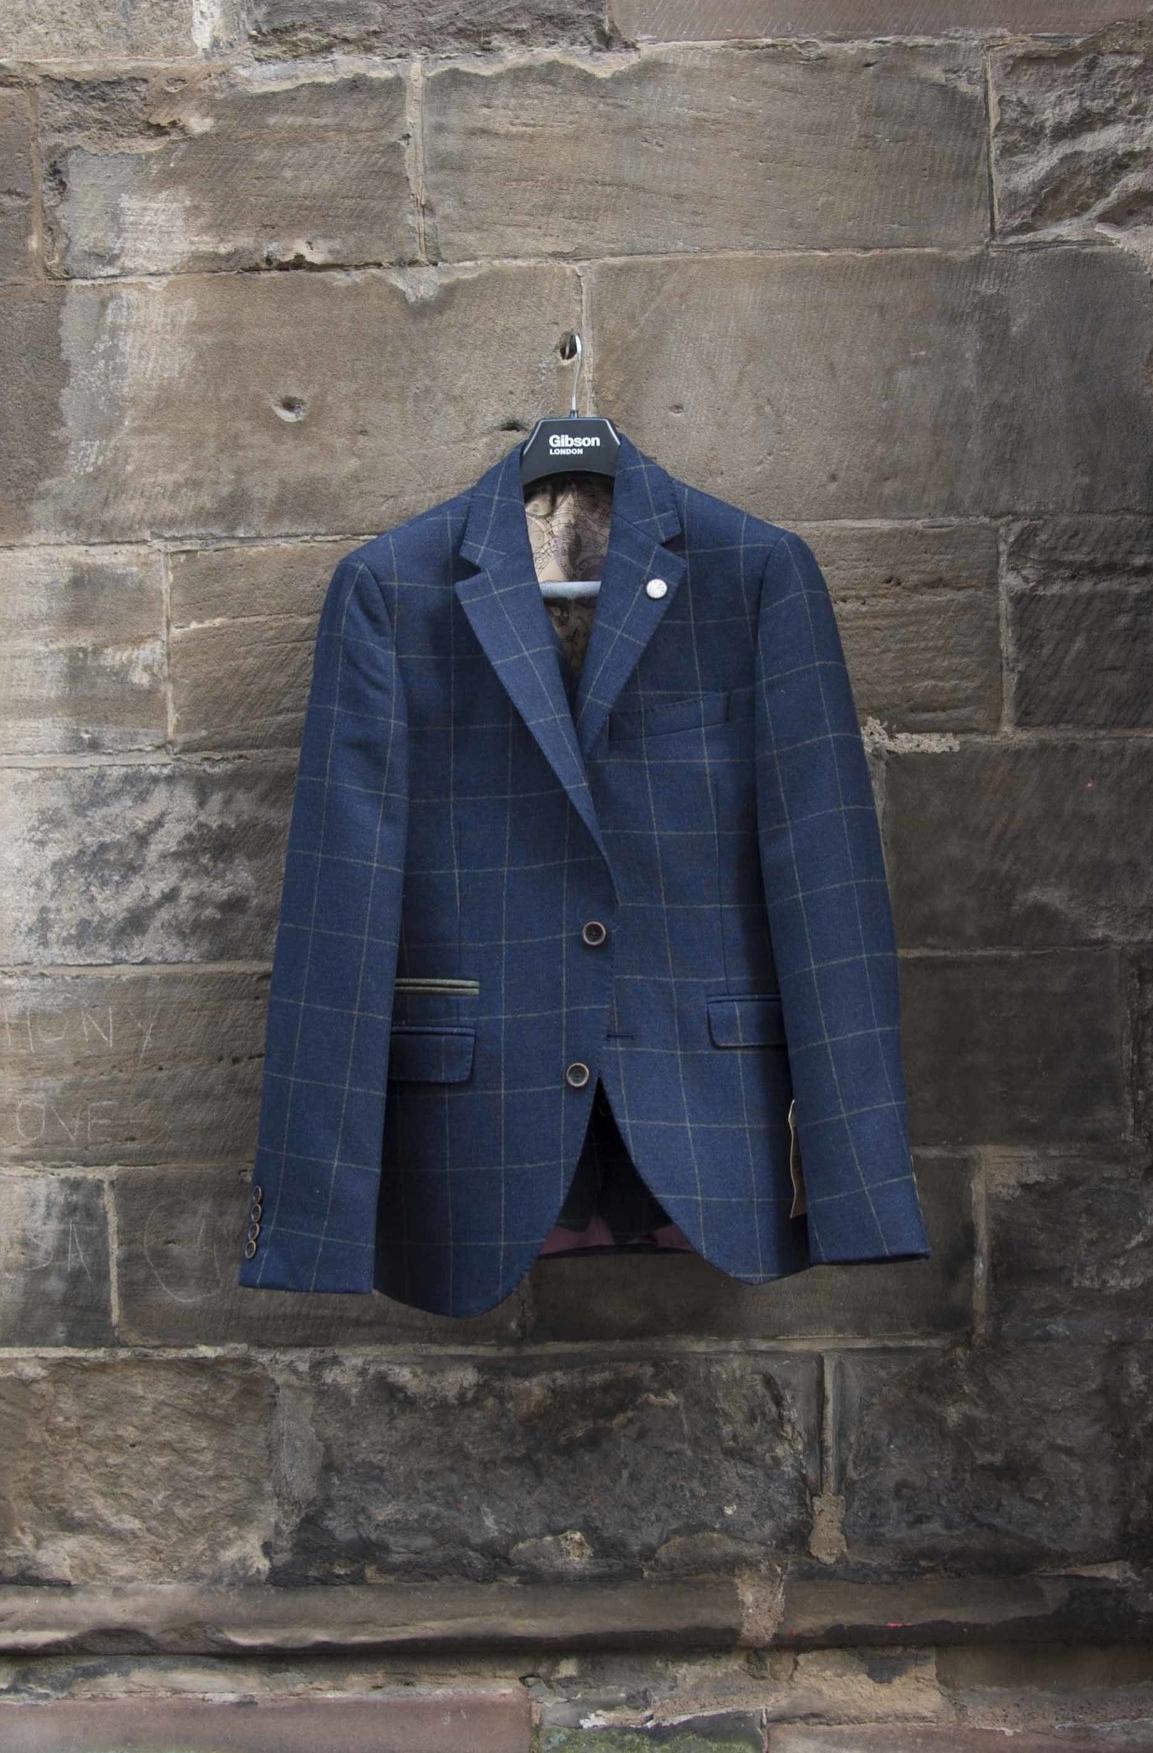 Fashionable man's blue tweed jacket